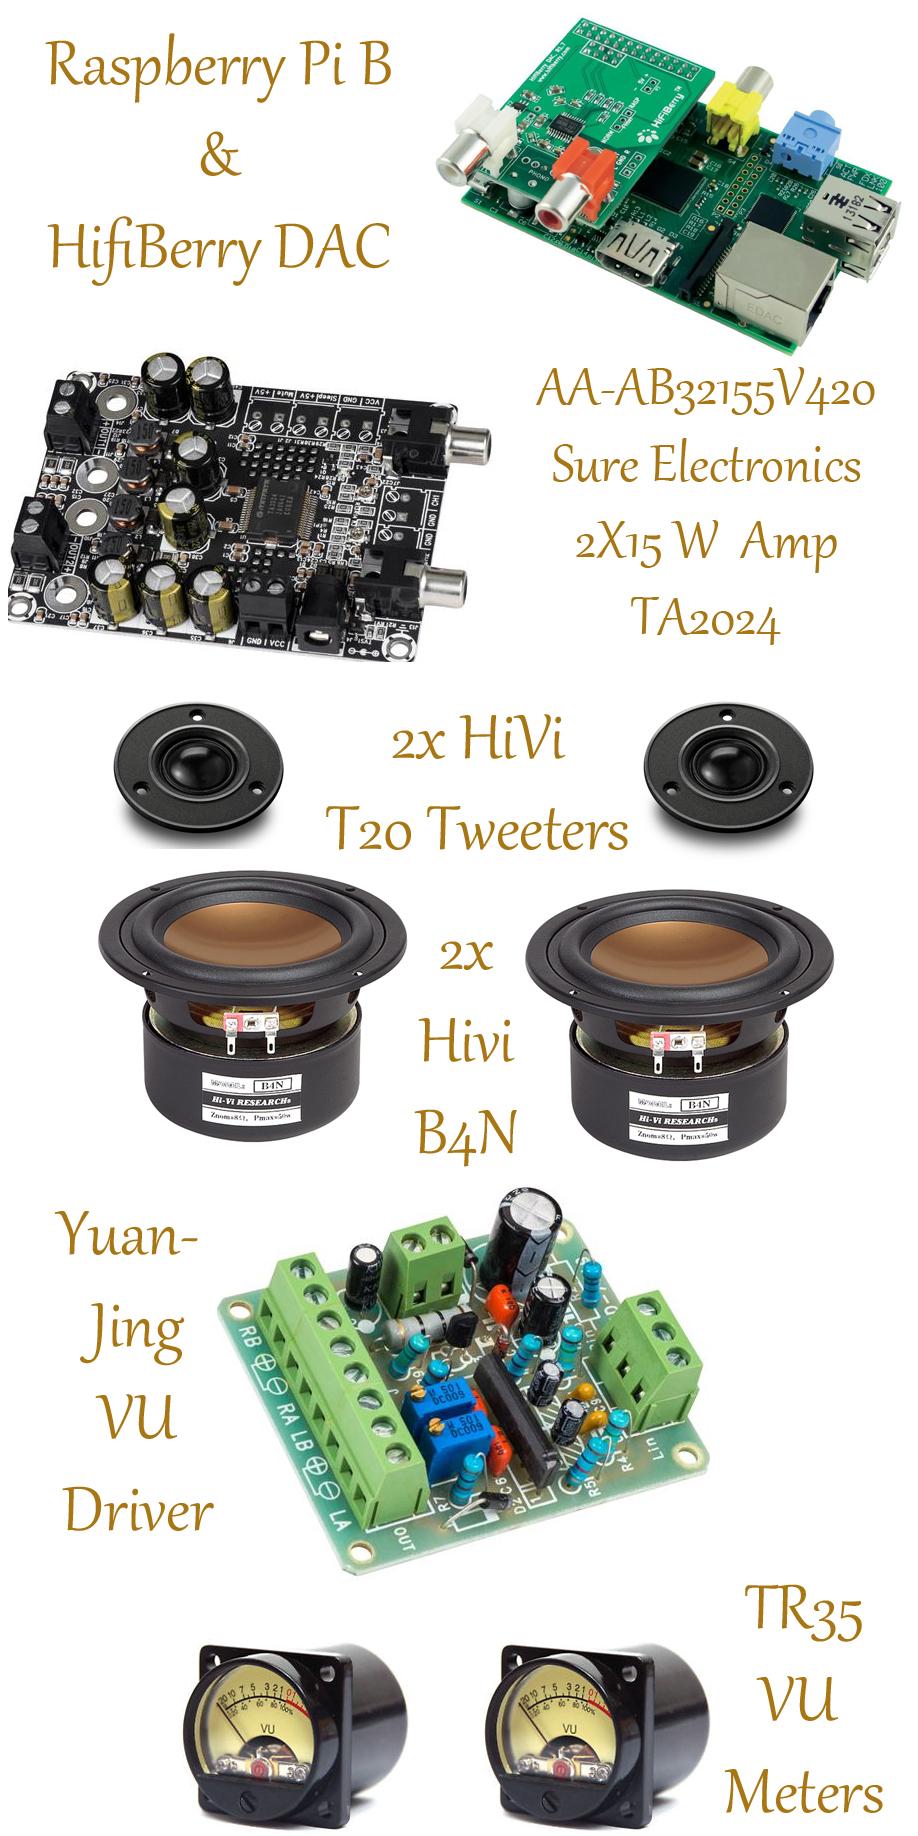 OS Boombox project with VU Meters - Techtalk Speaker Building, Audio ...